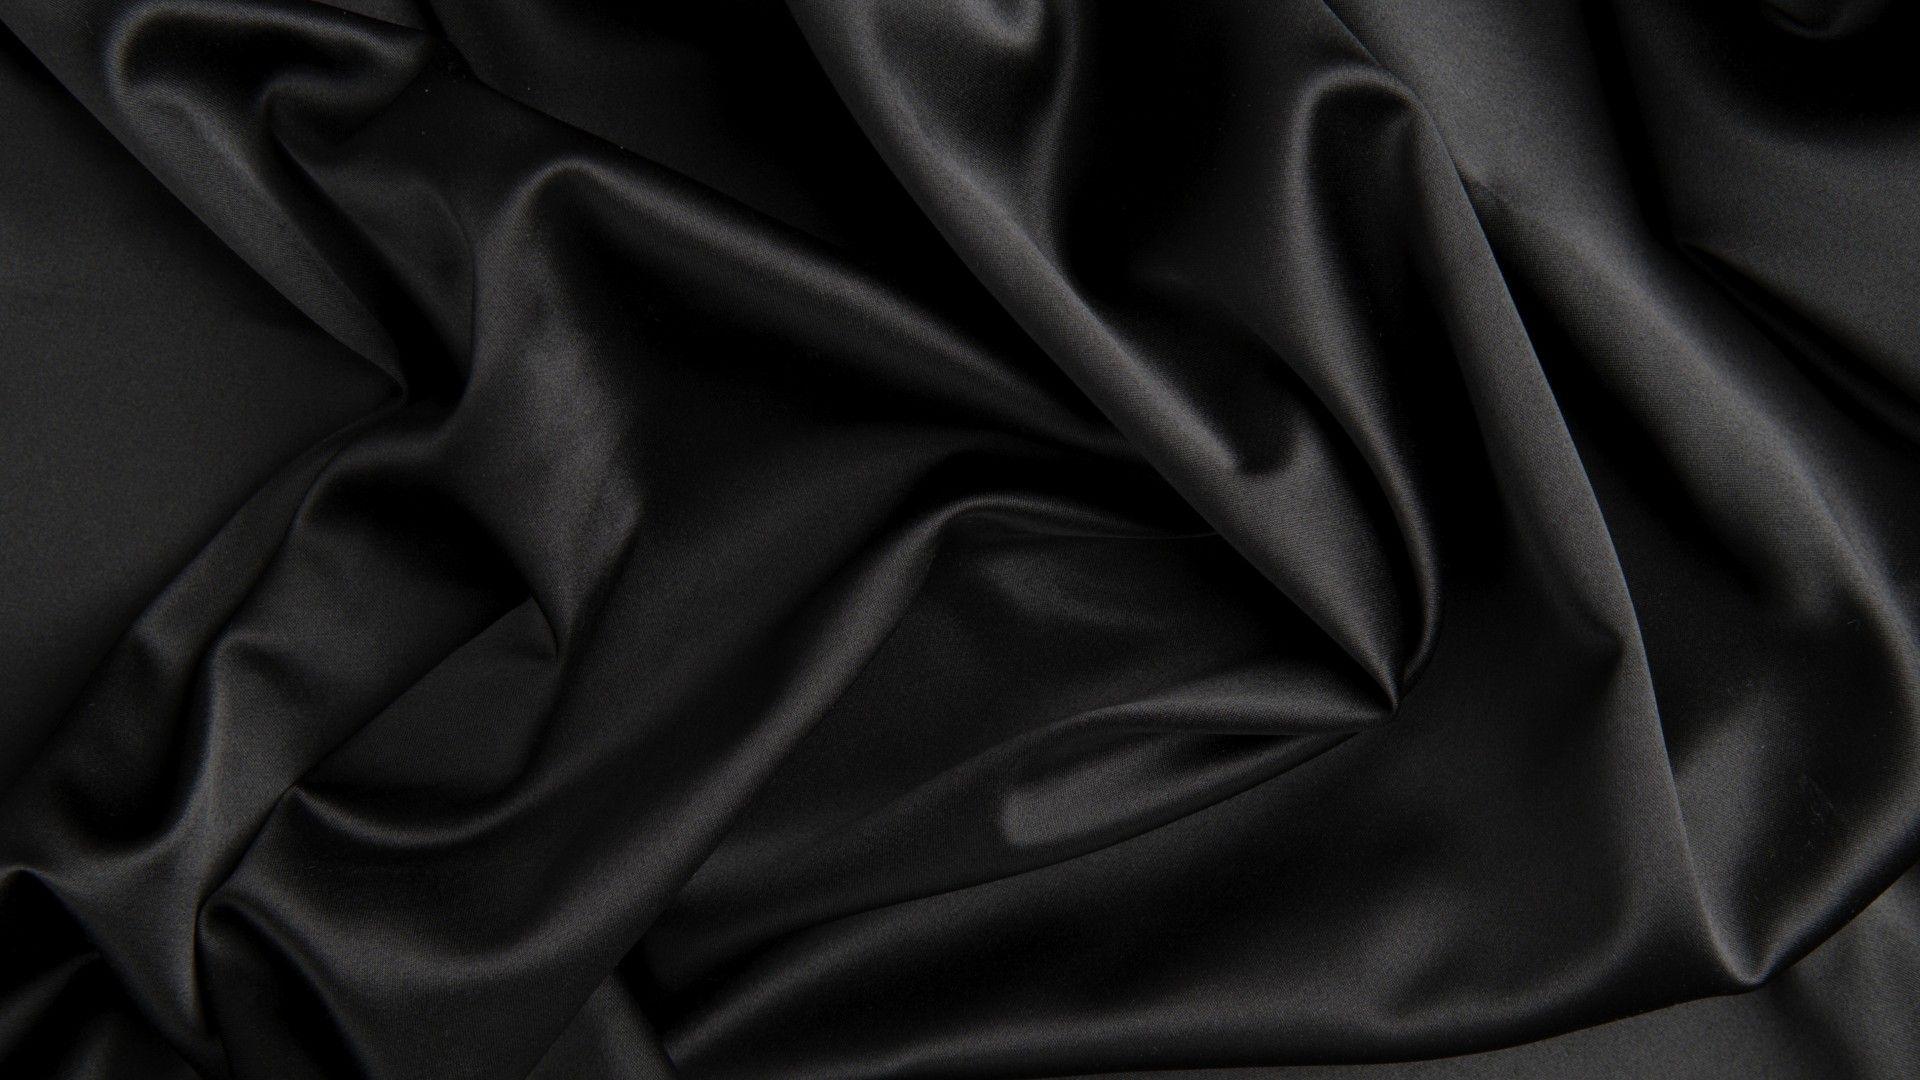 Pin By Samantha Keller On Background Factory Silk Satin Fabric Black Silk Silk Fabric